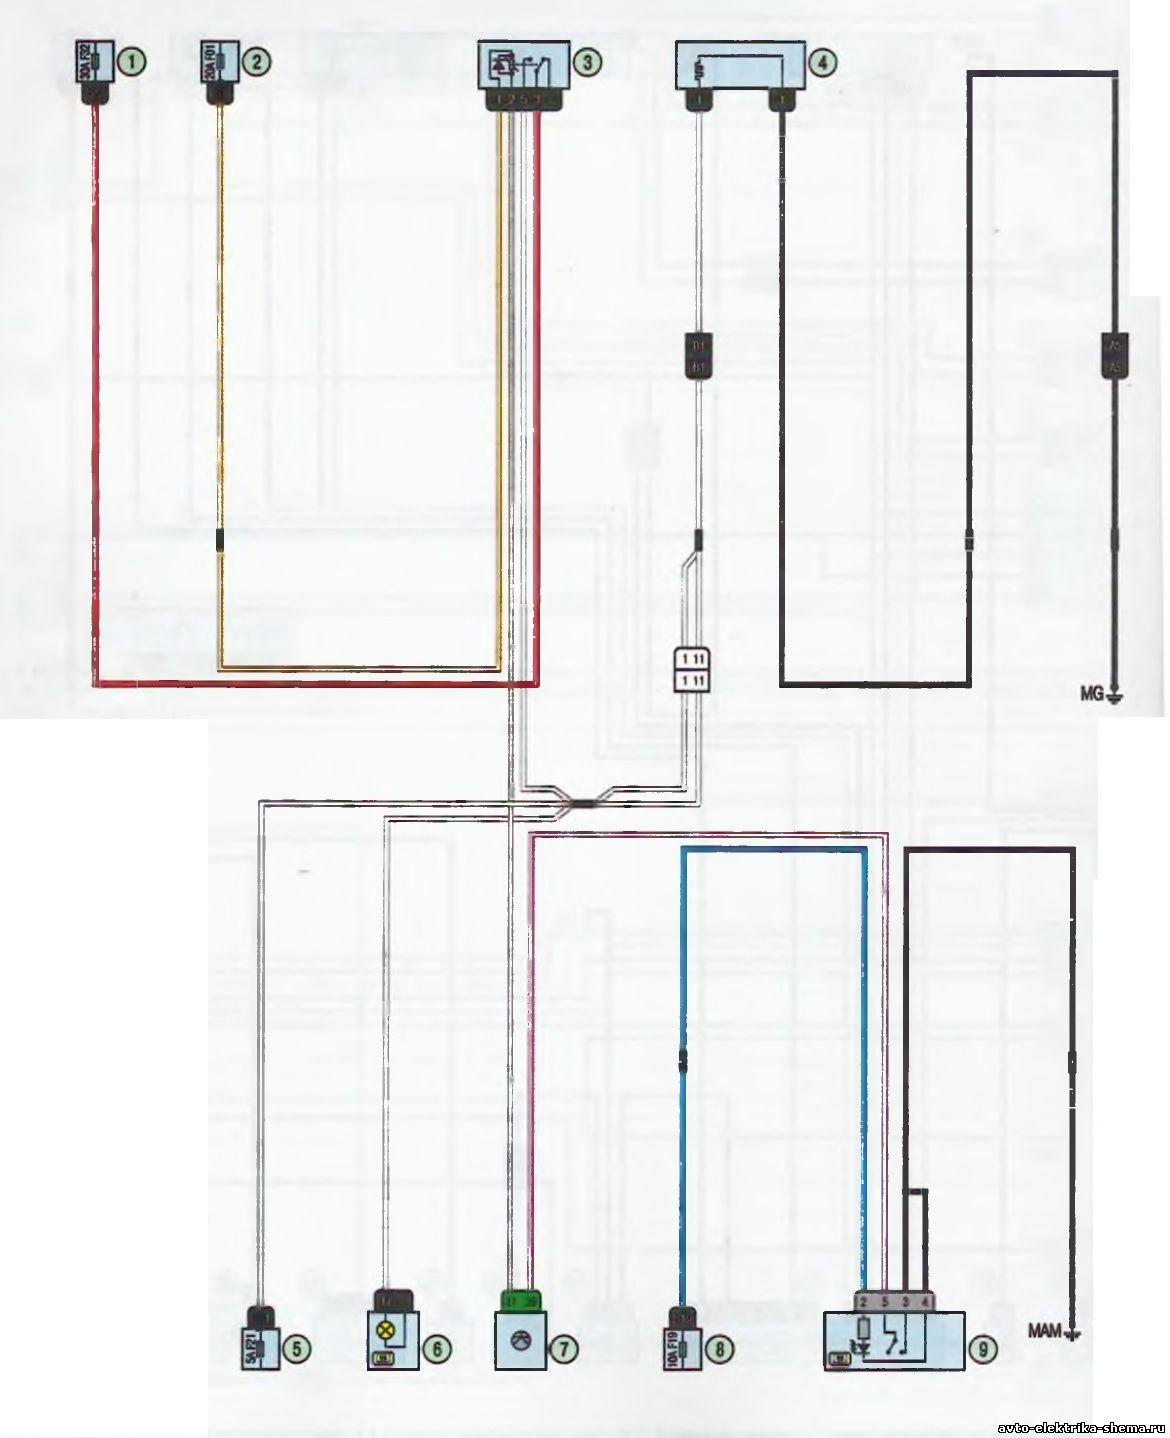 s23 - Схема центрального замка ларгус